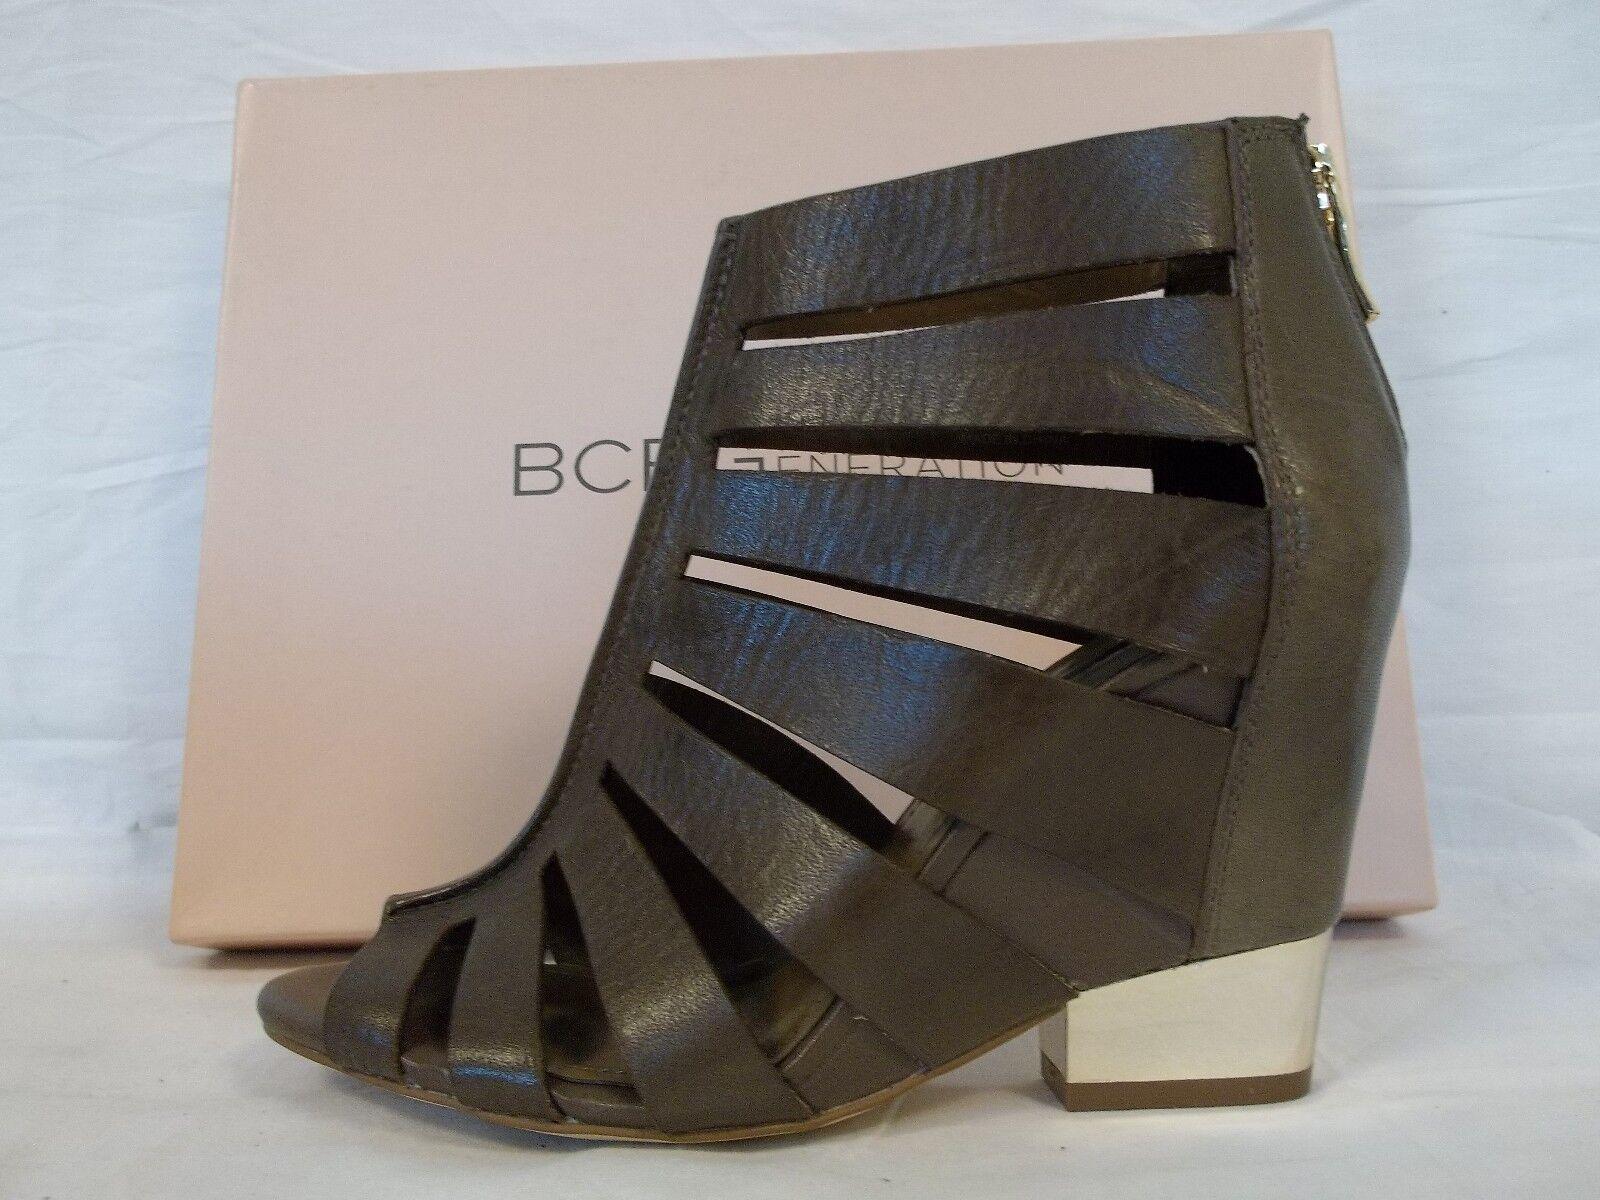 BCBGeneration BCBG Heels Sz 9.5 M Charlie Slate Leder Wedges Heels BCBG New Damenschuhe Schuhes e6f5cf